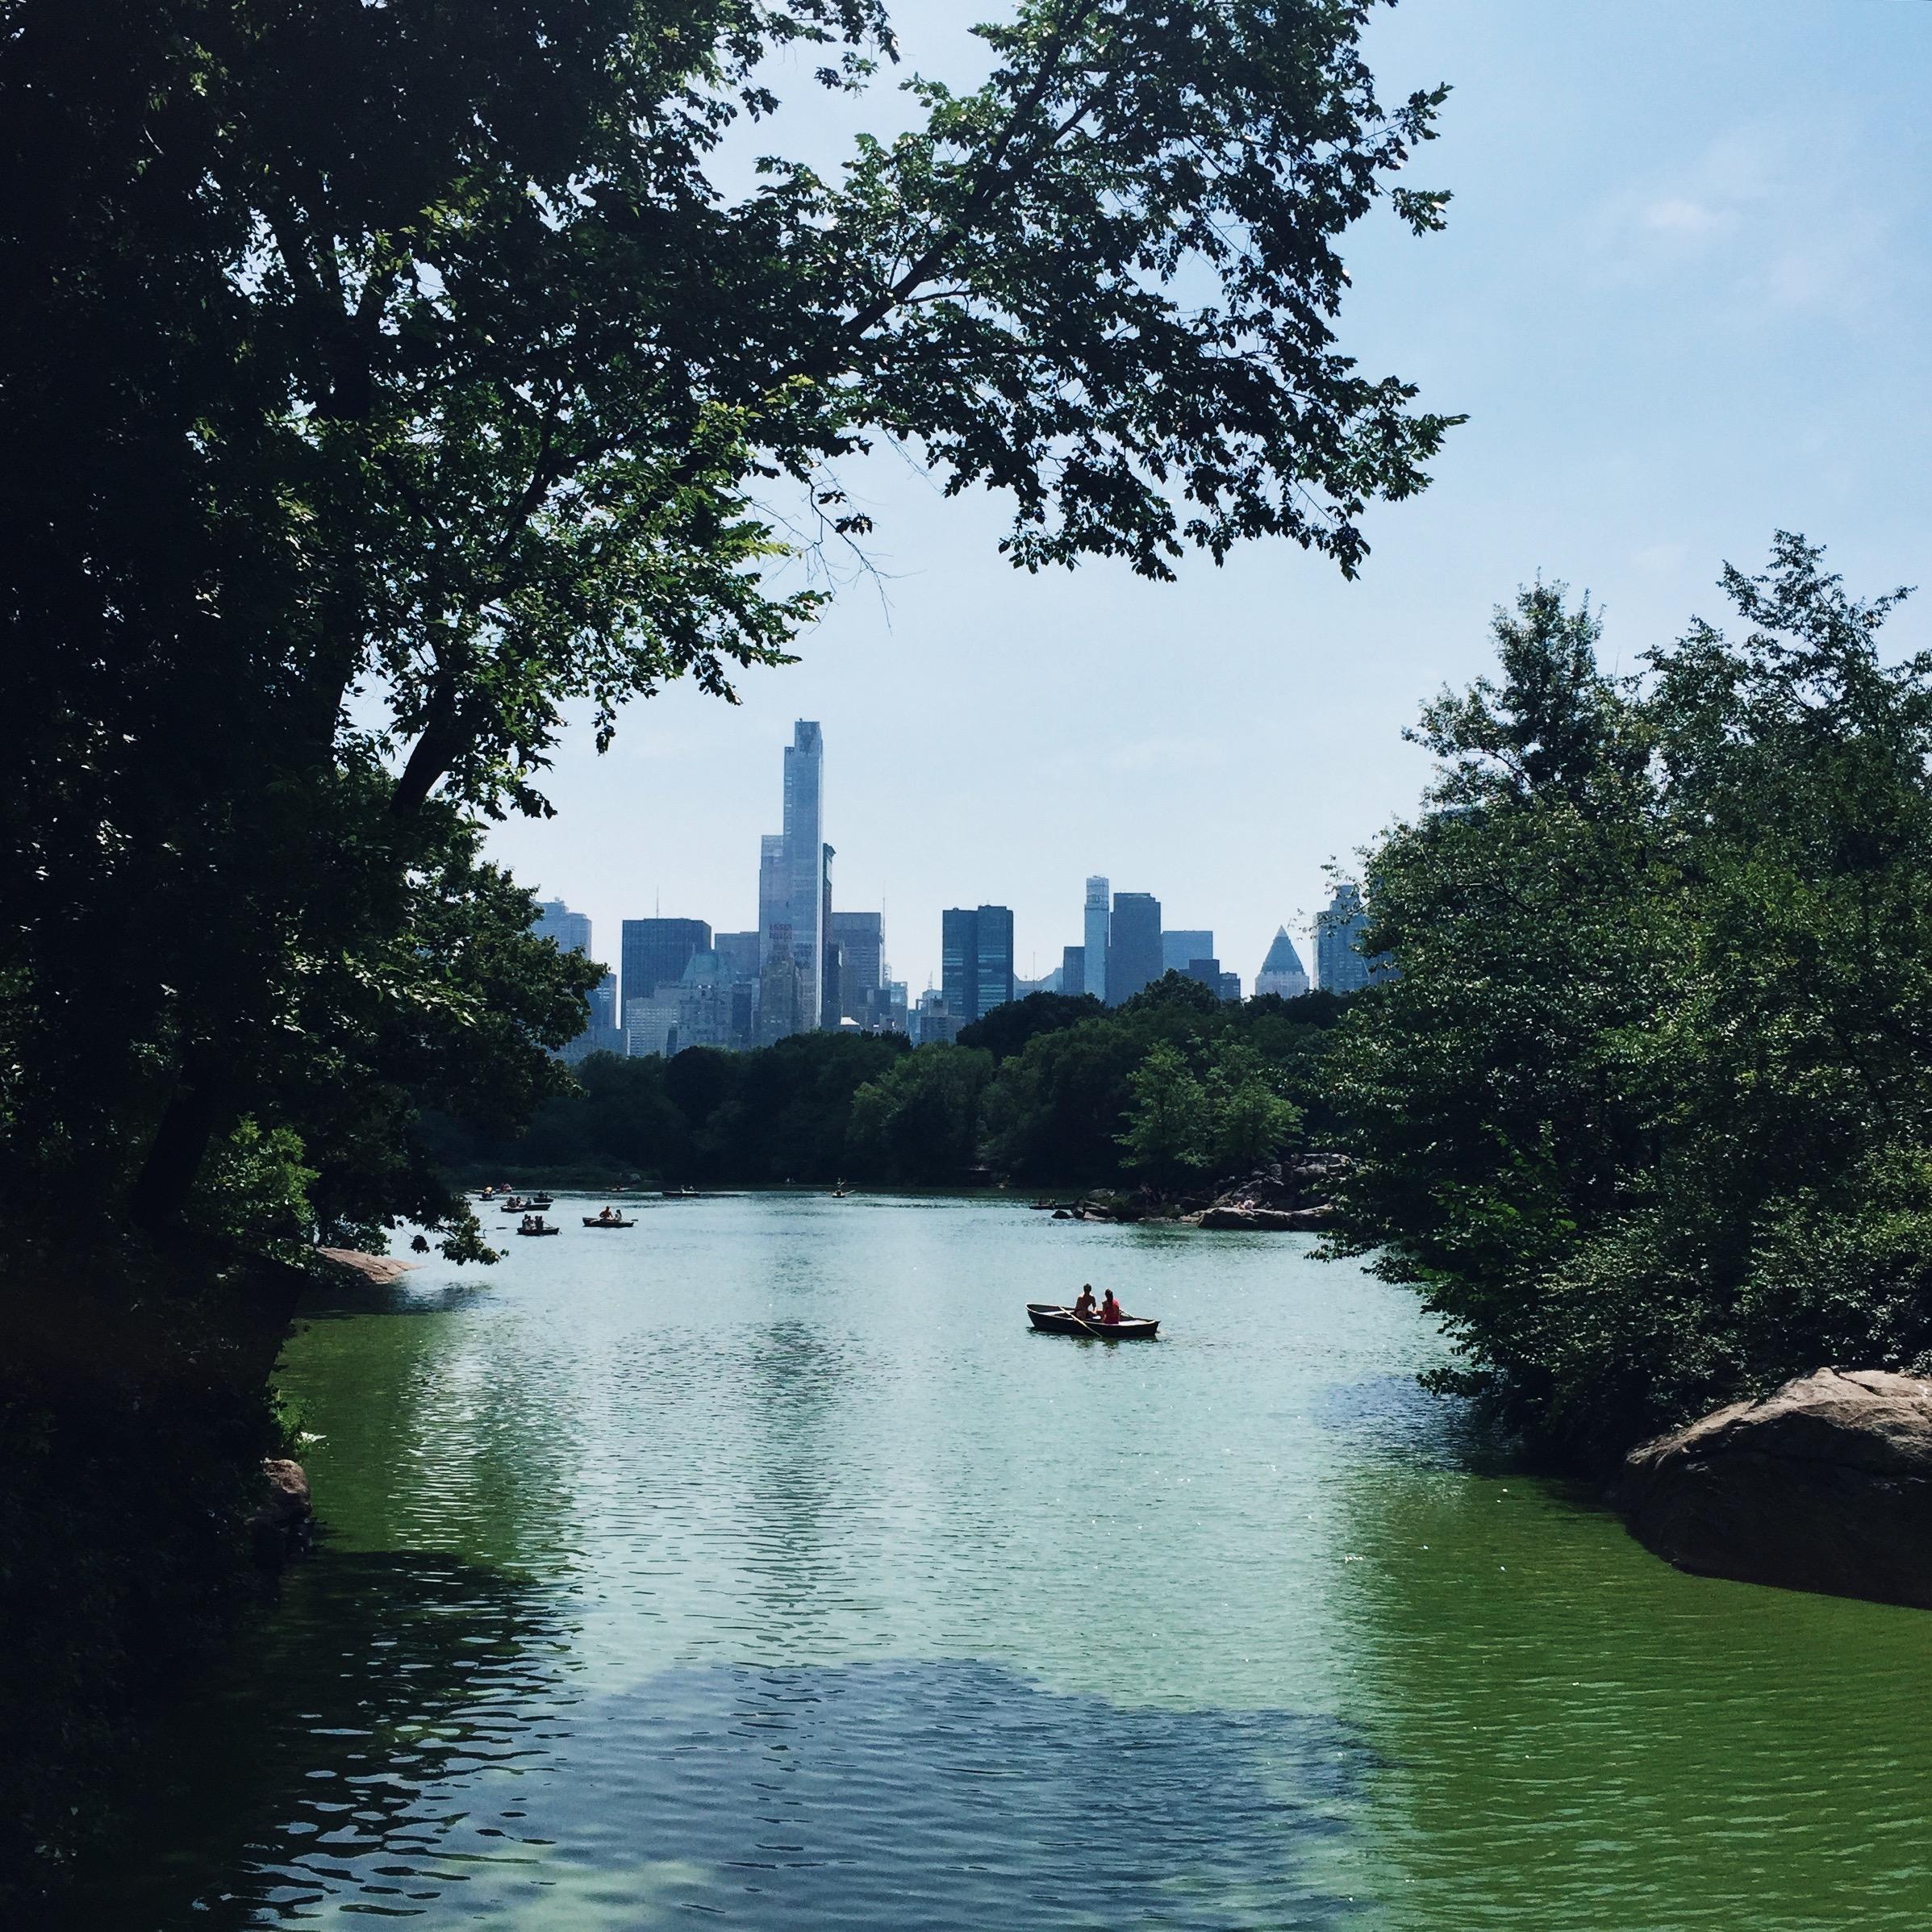 Kayaking in Central Park